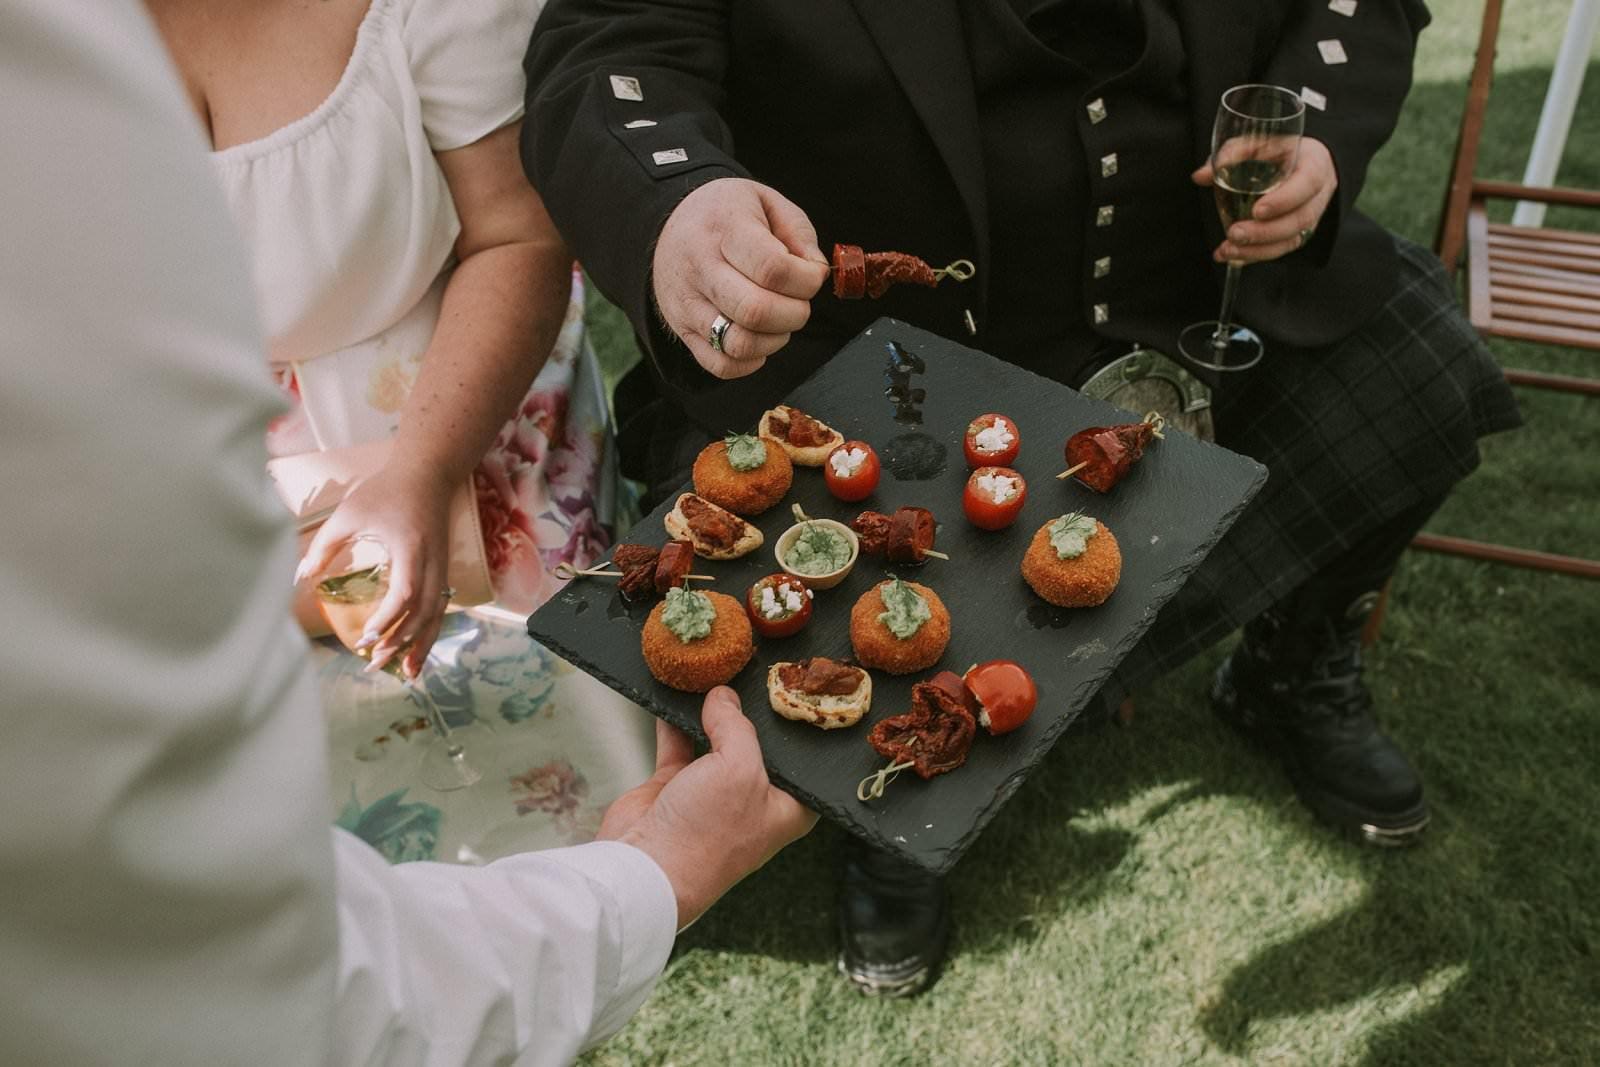 abbotsford-house-wedding-photographer-16